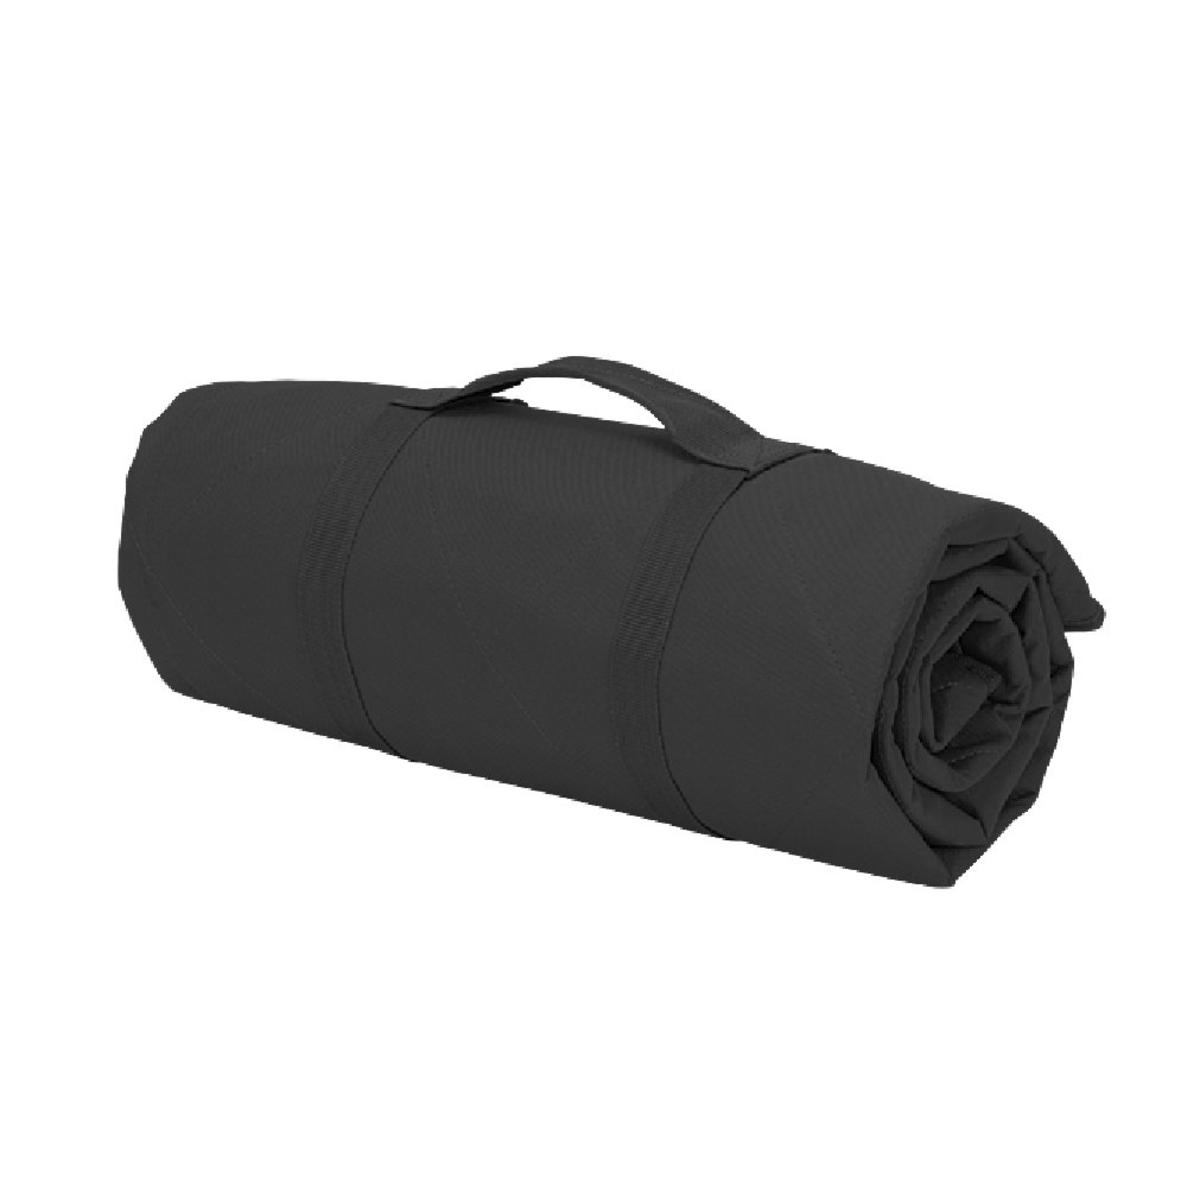 Voodoo Tactical Lightweight Roll Up Shooting Mat Ebay